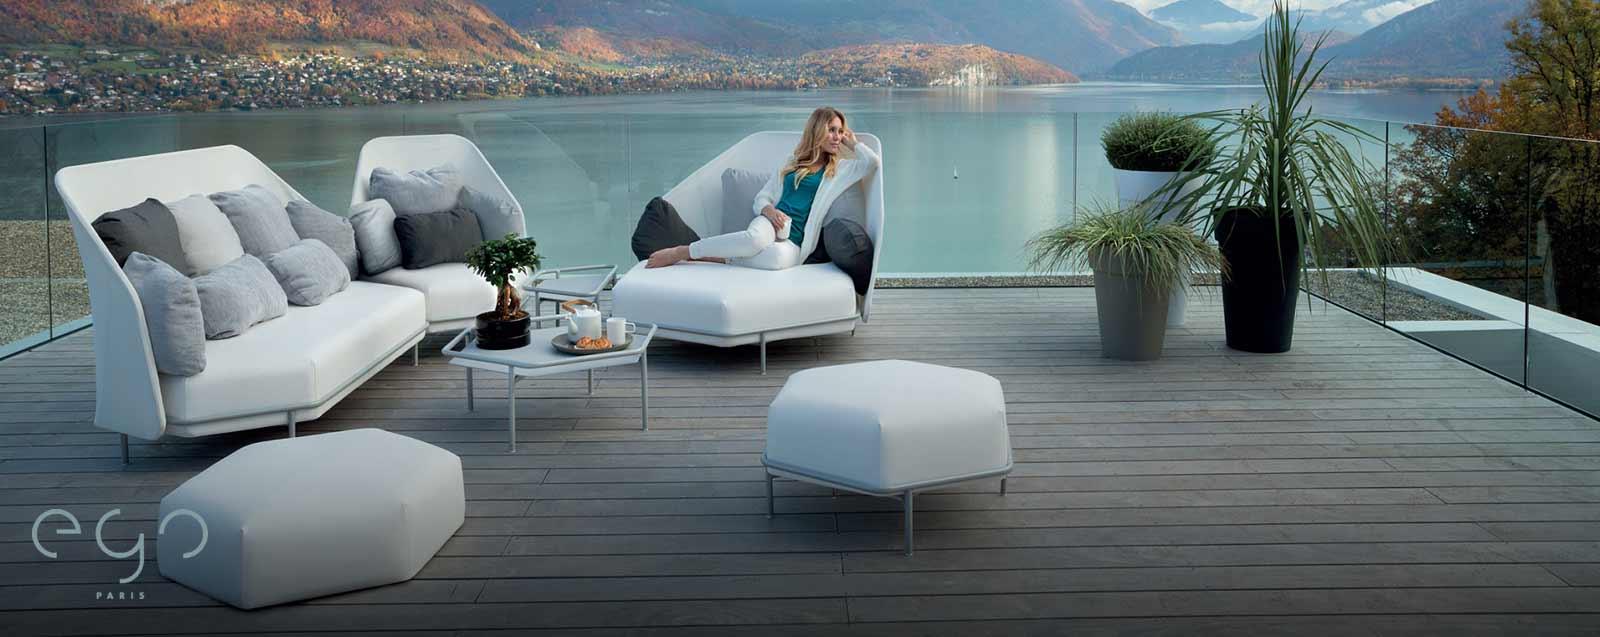 mobili giardino convenienti: mobili da giardino foto design mag ... - Mobili Convenienza Egos